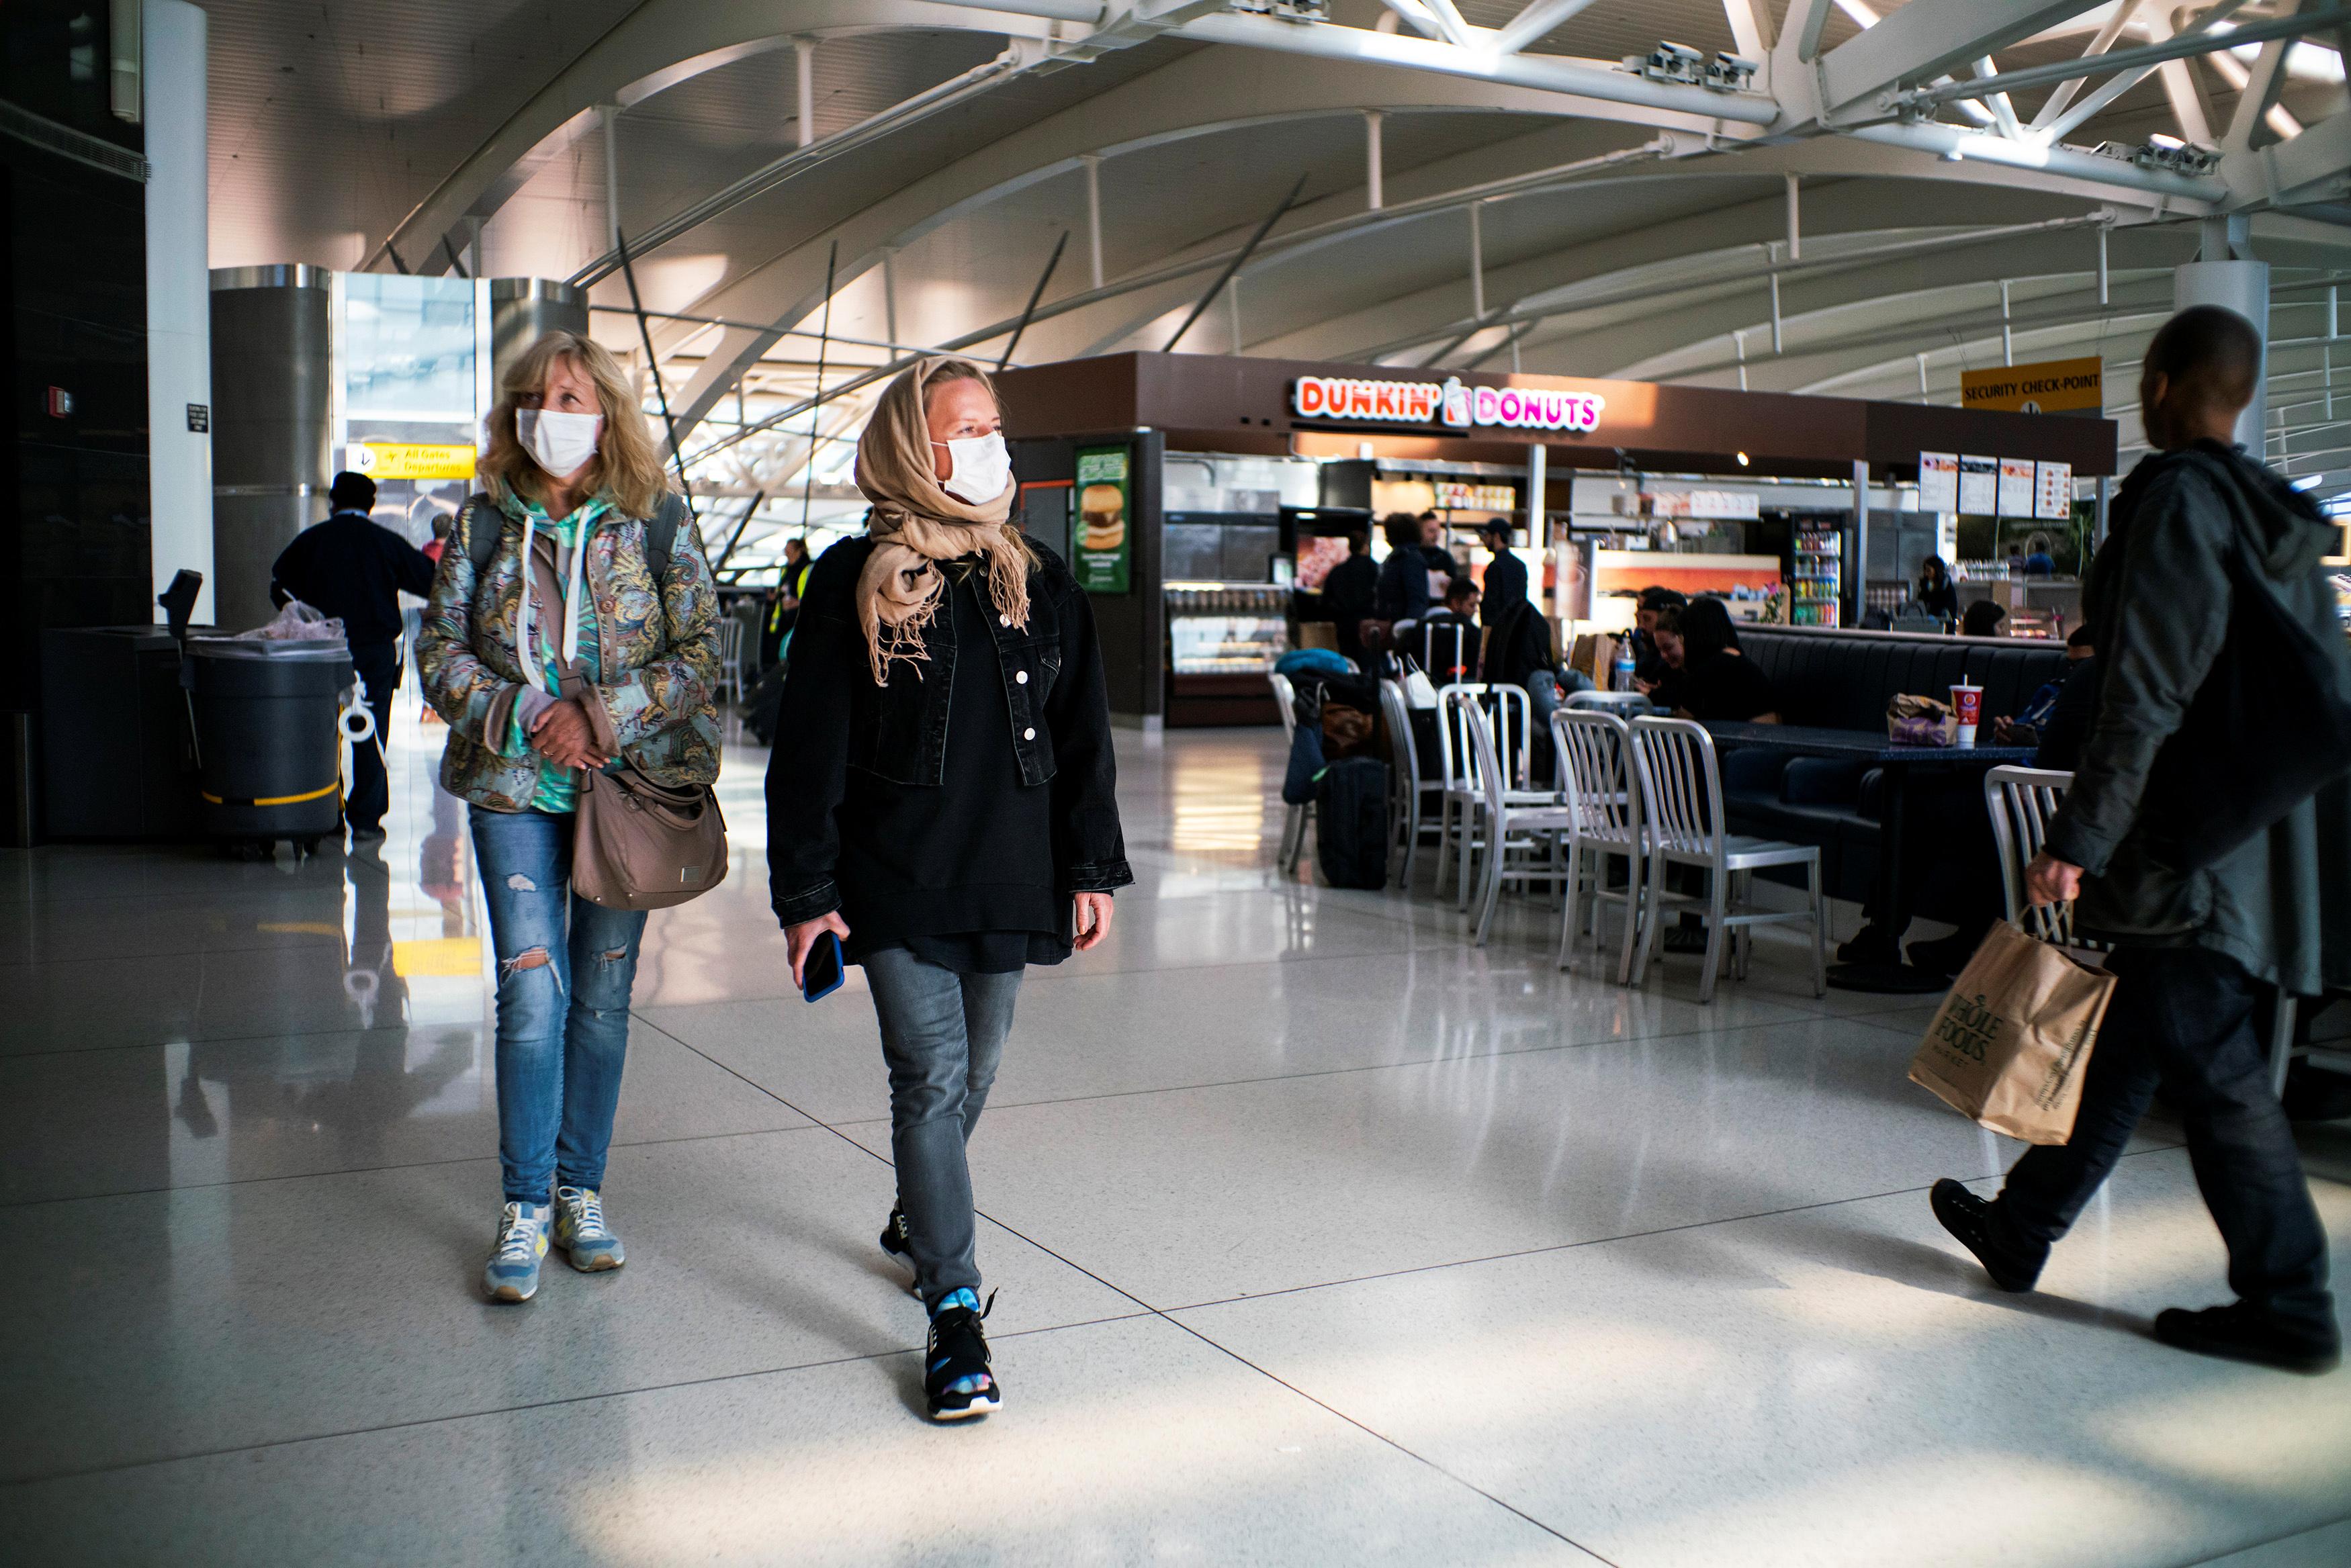 Jfk Terminal 7 Arrivals Meeting Point